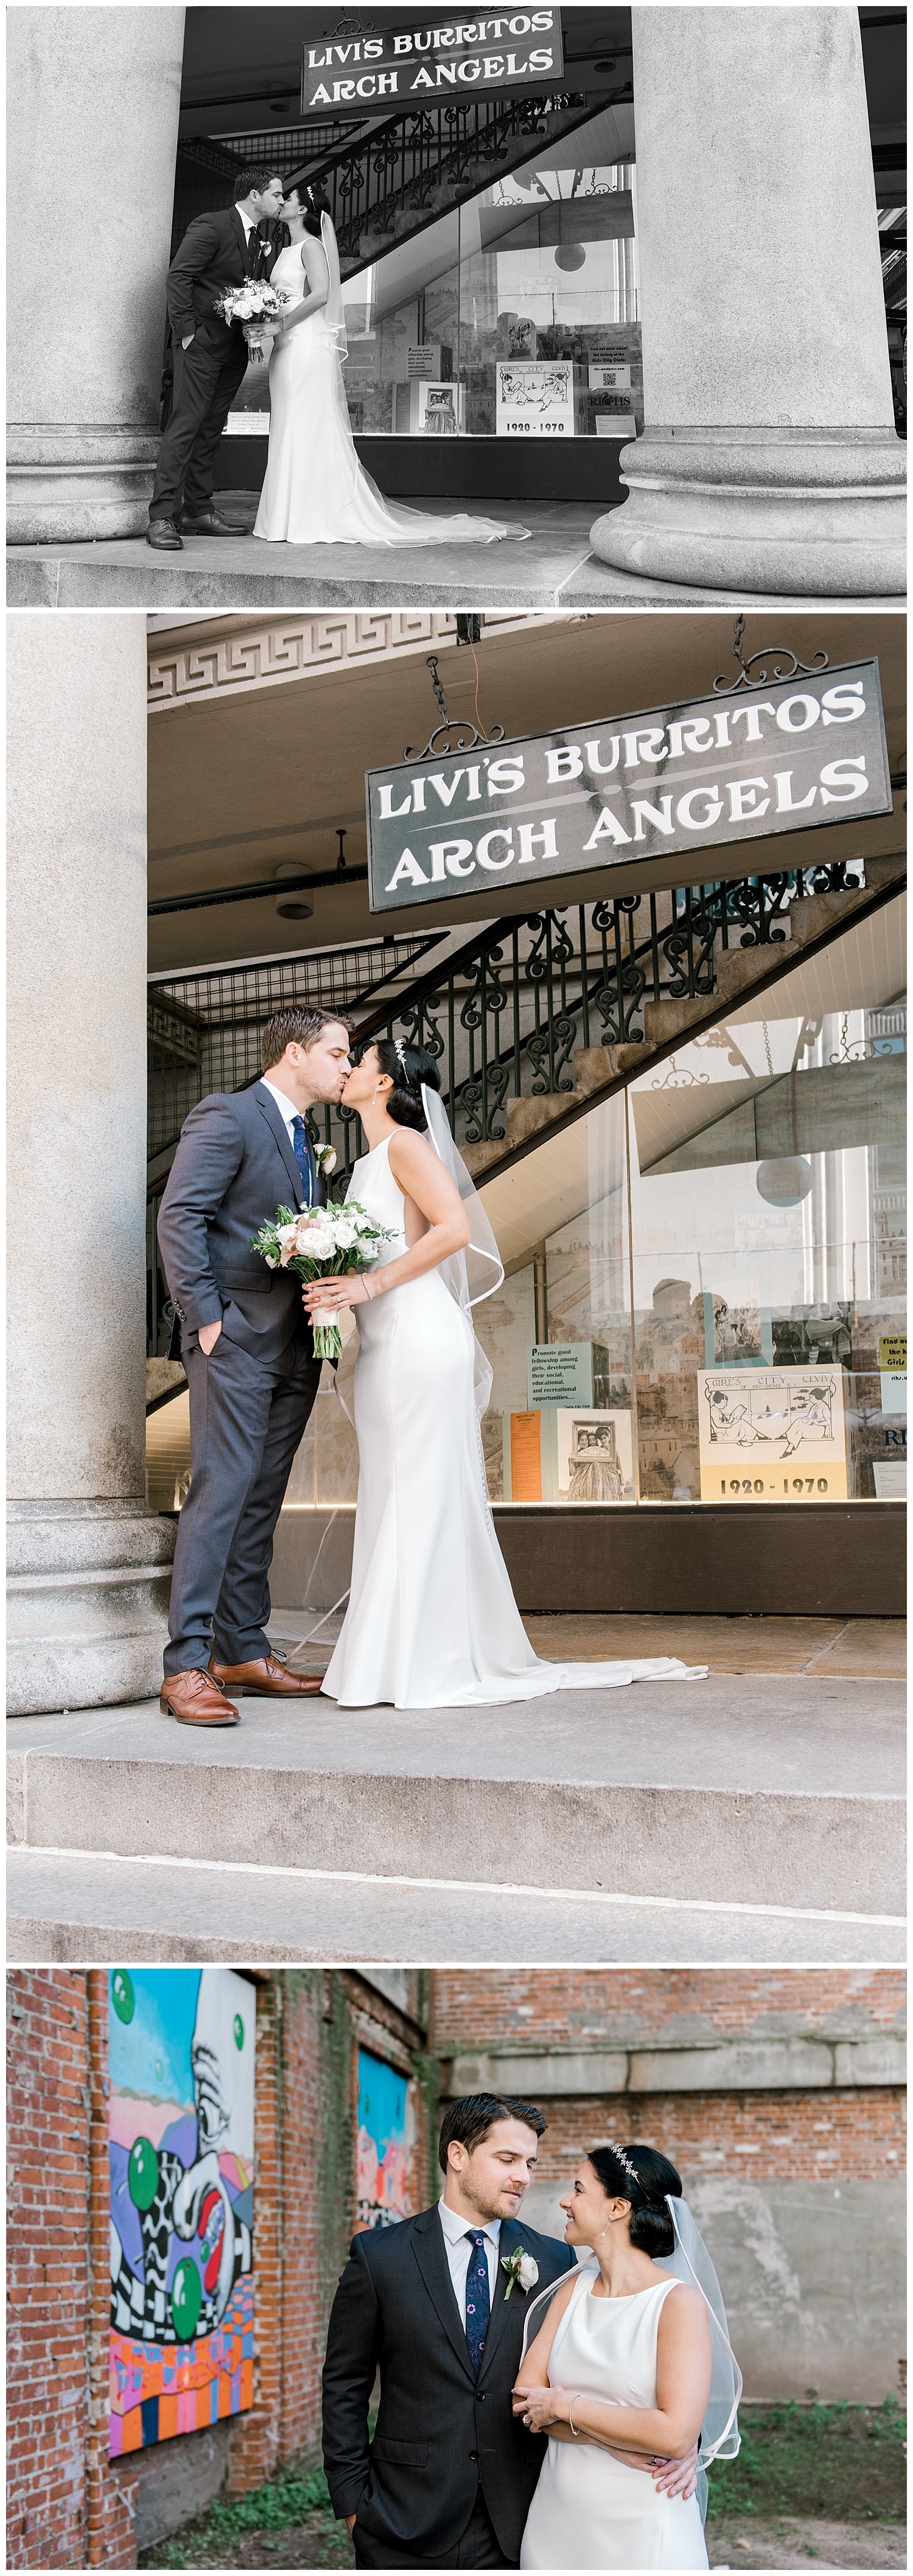 the-dorrance-providence-wedding-photography-october19-photo-6.jpg